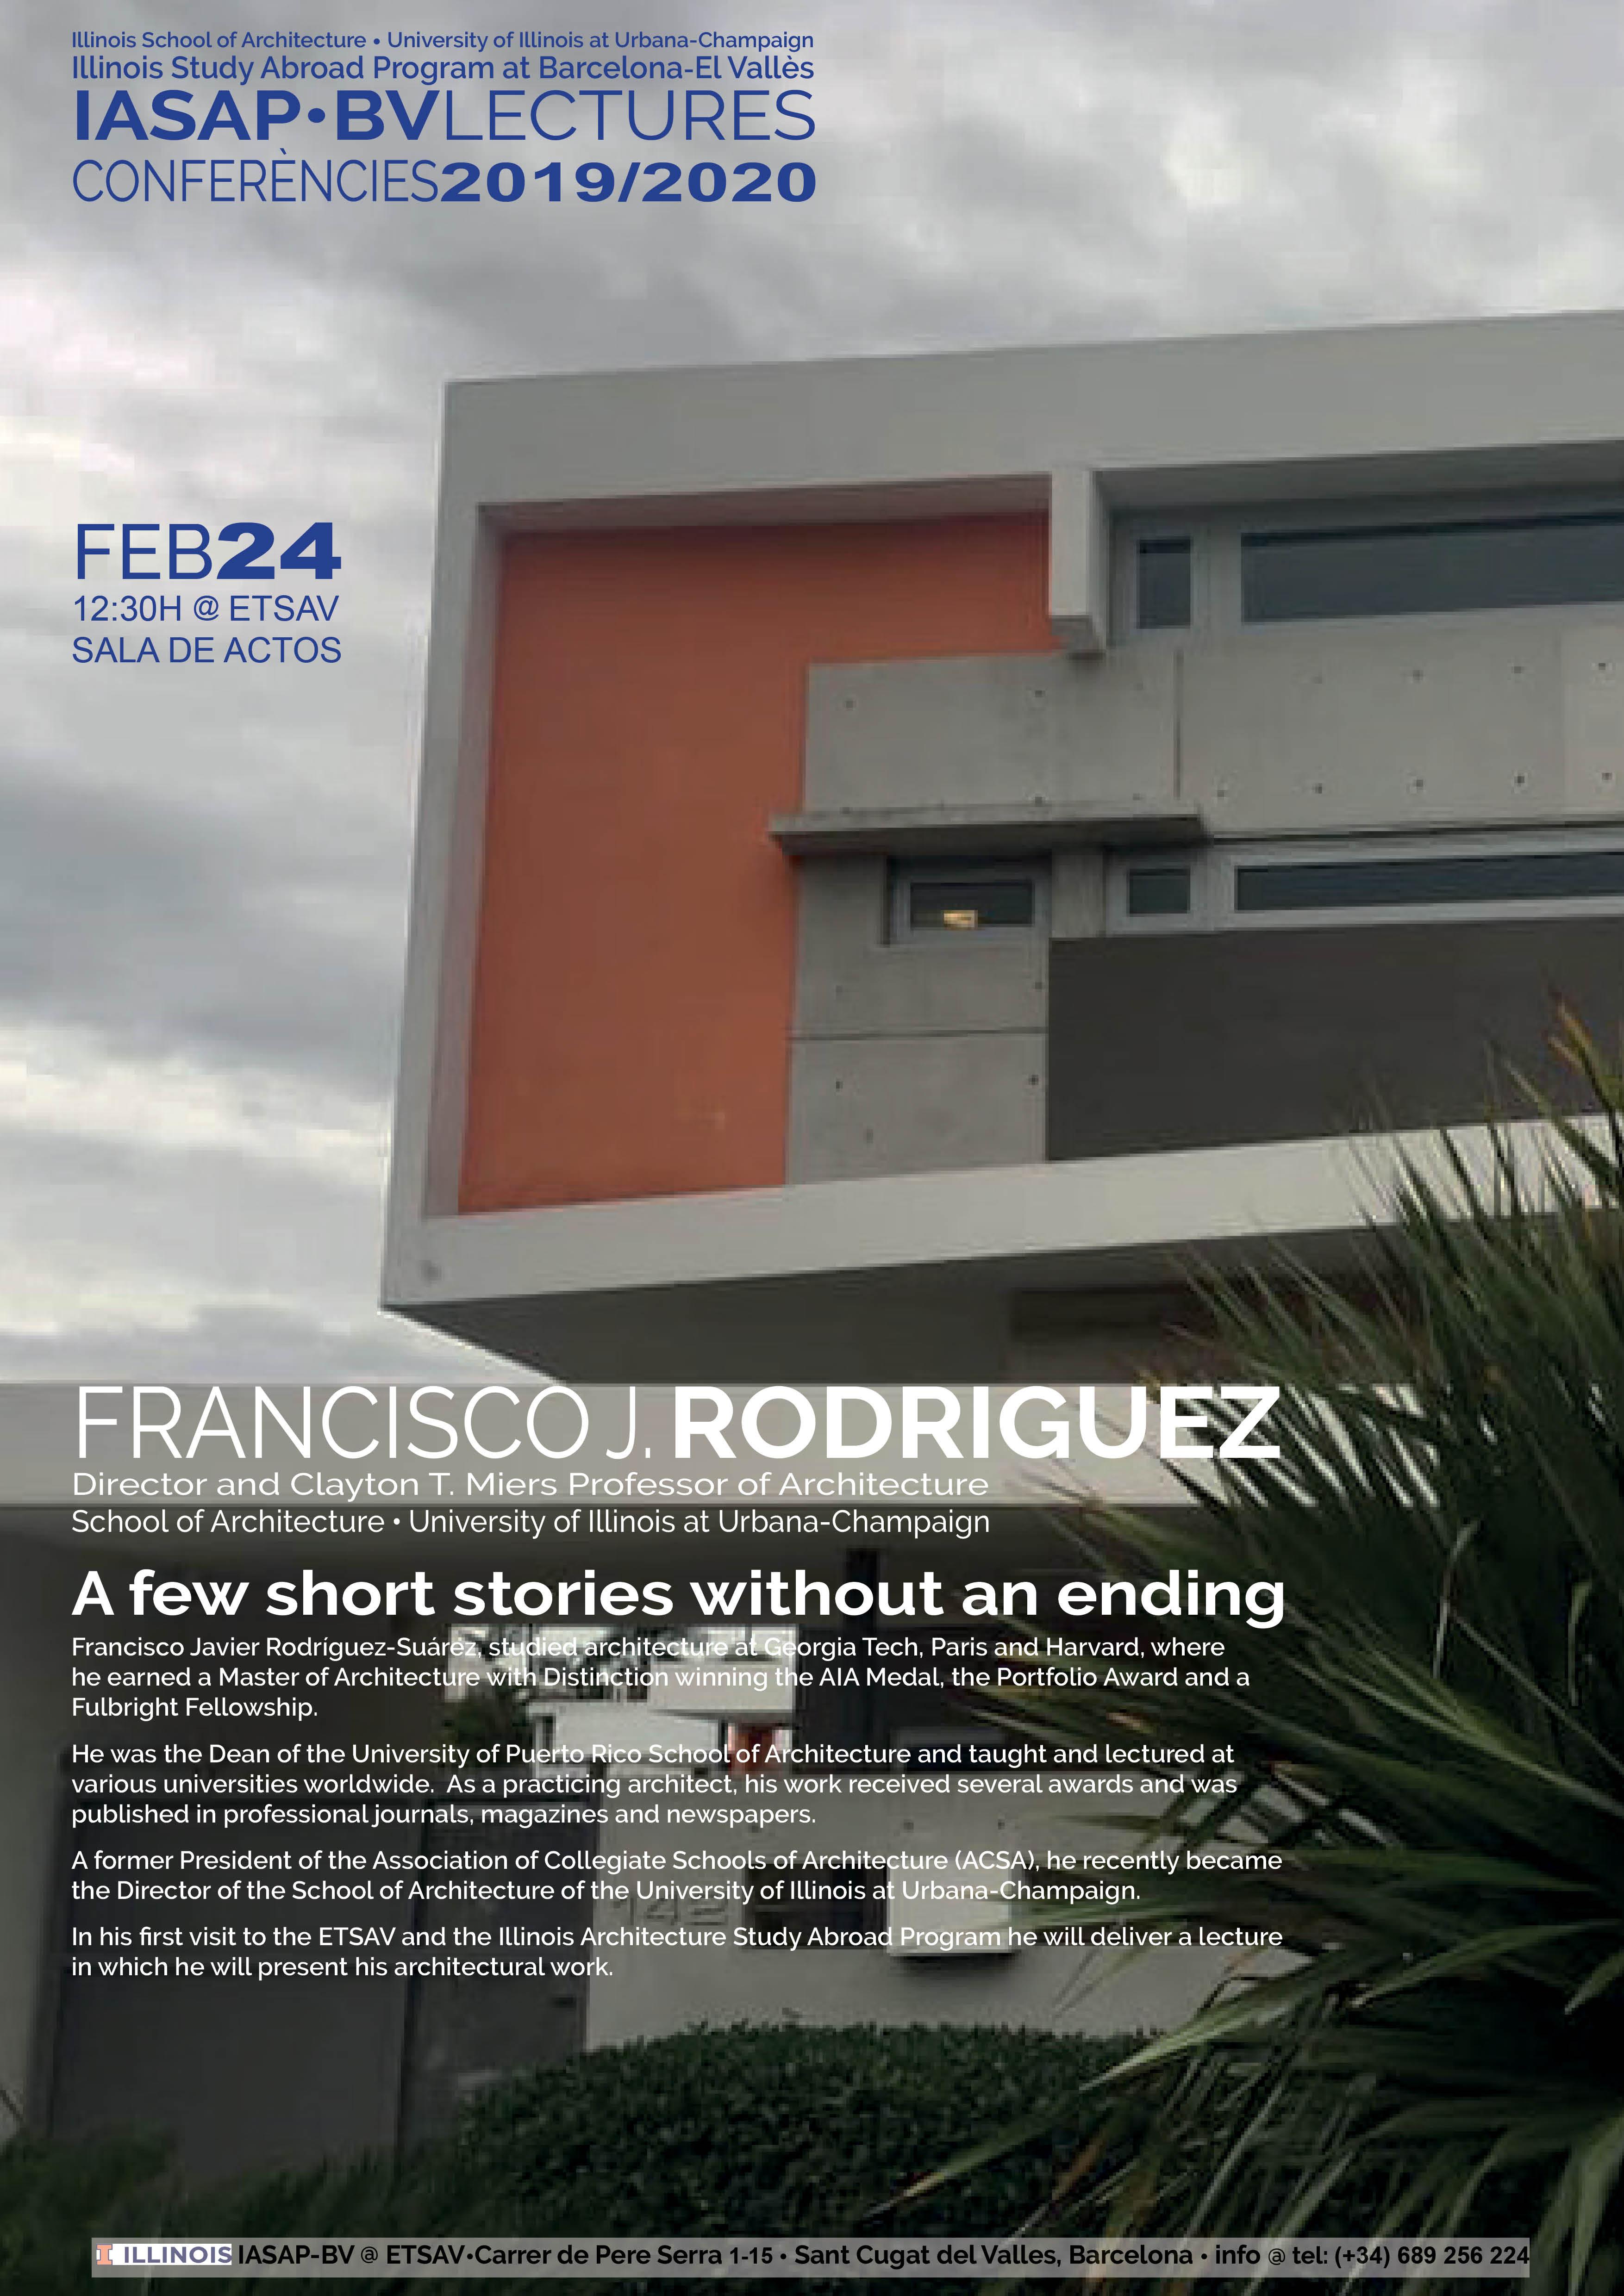 Conferencia Francisco Javier Rodriguez Suárez - Director d'Illinois